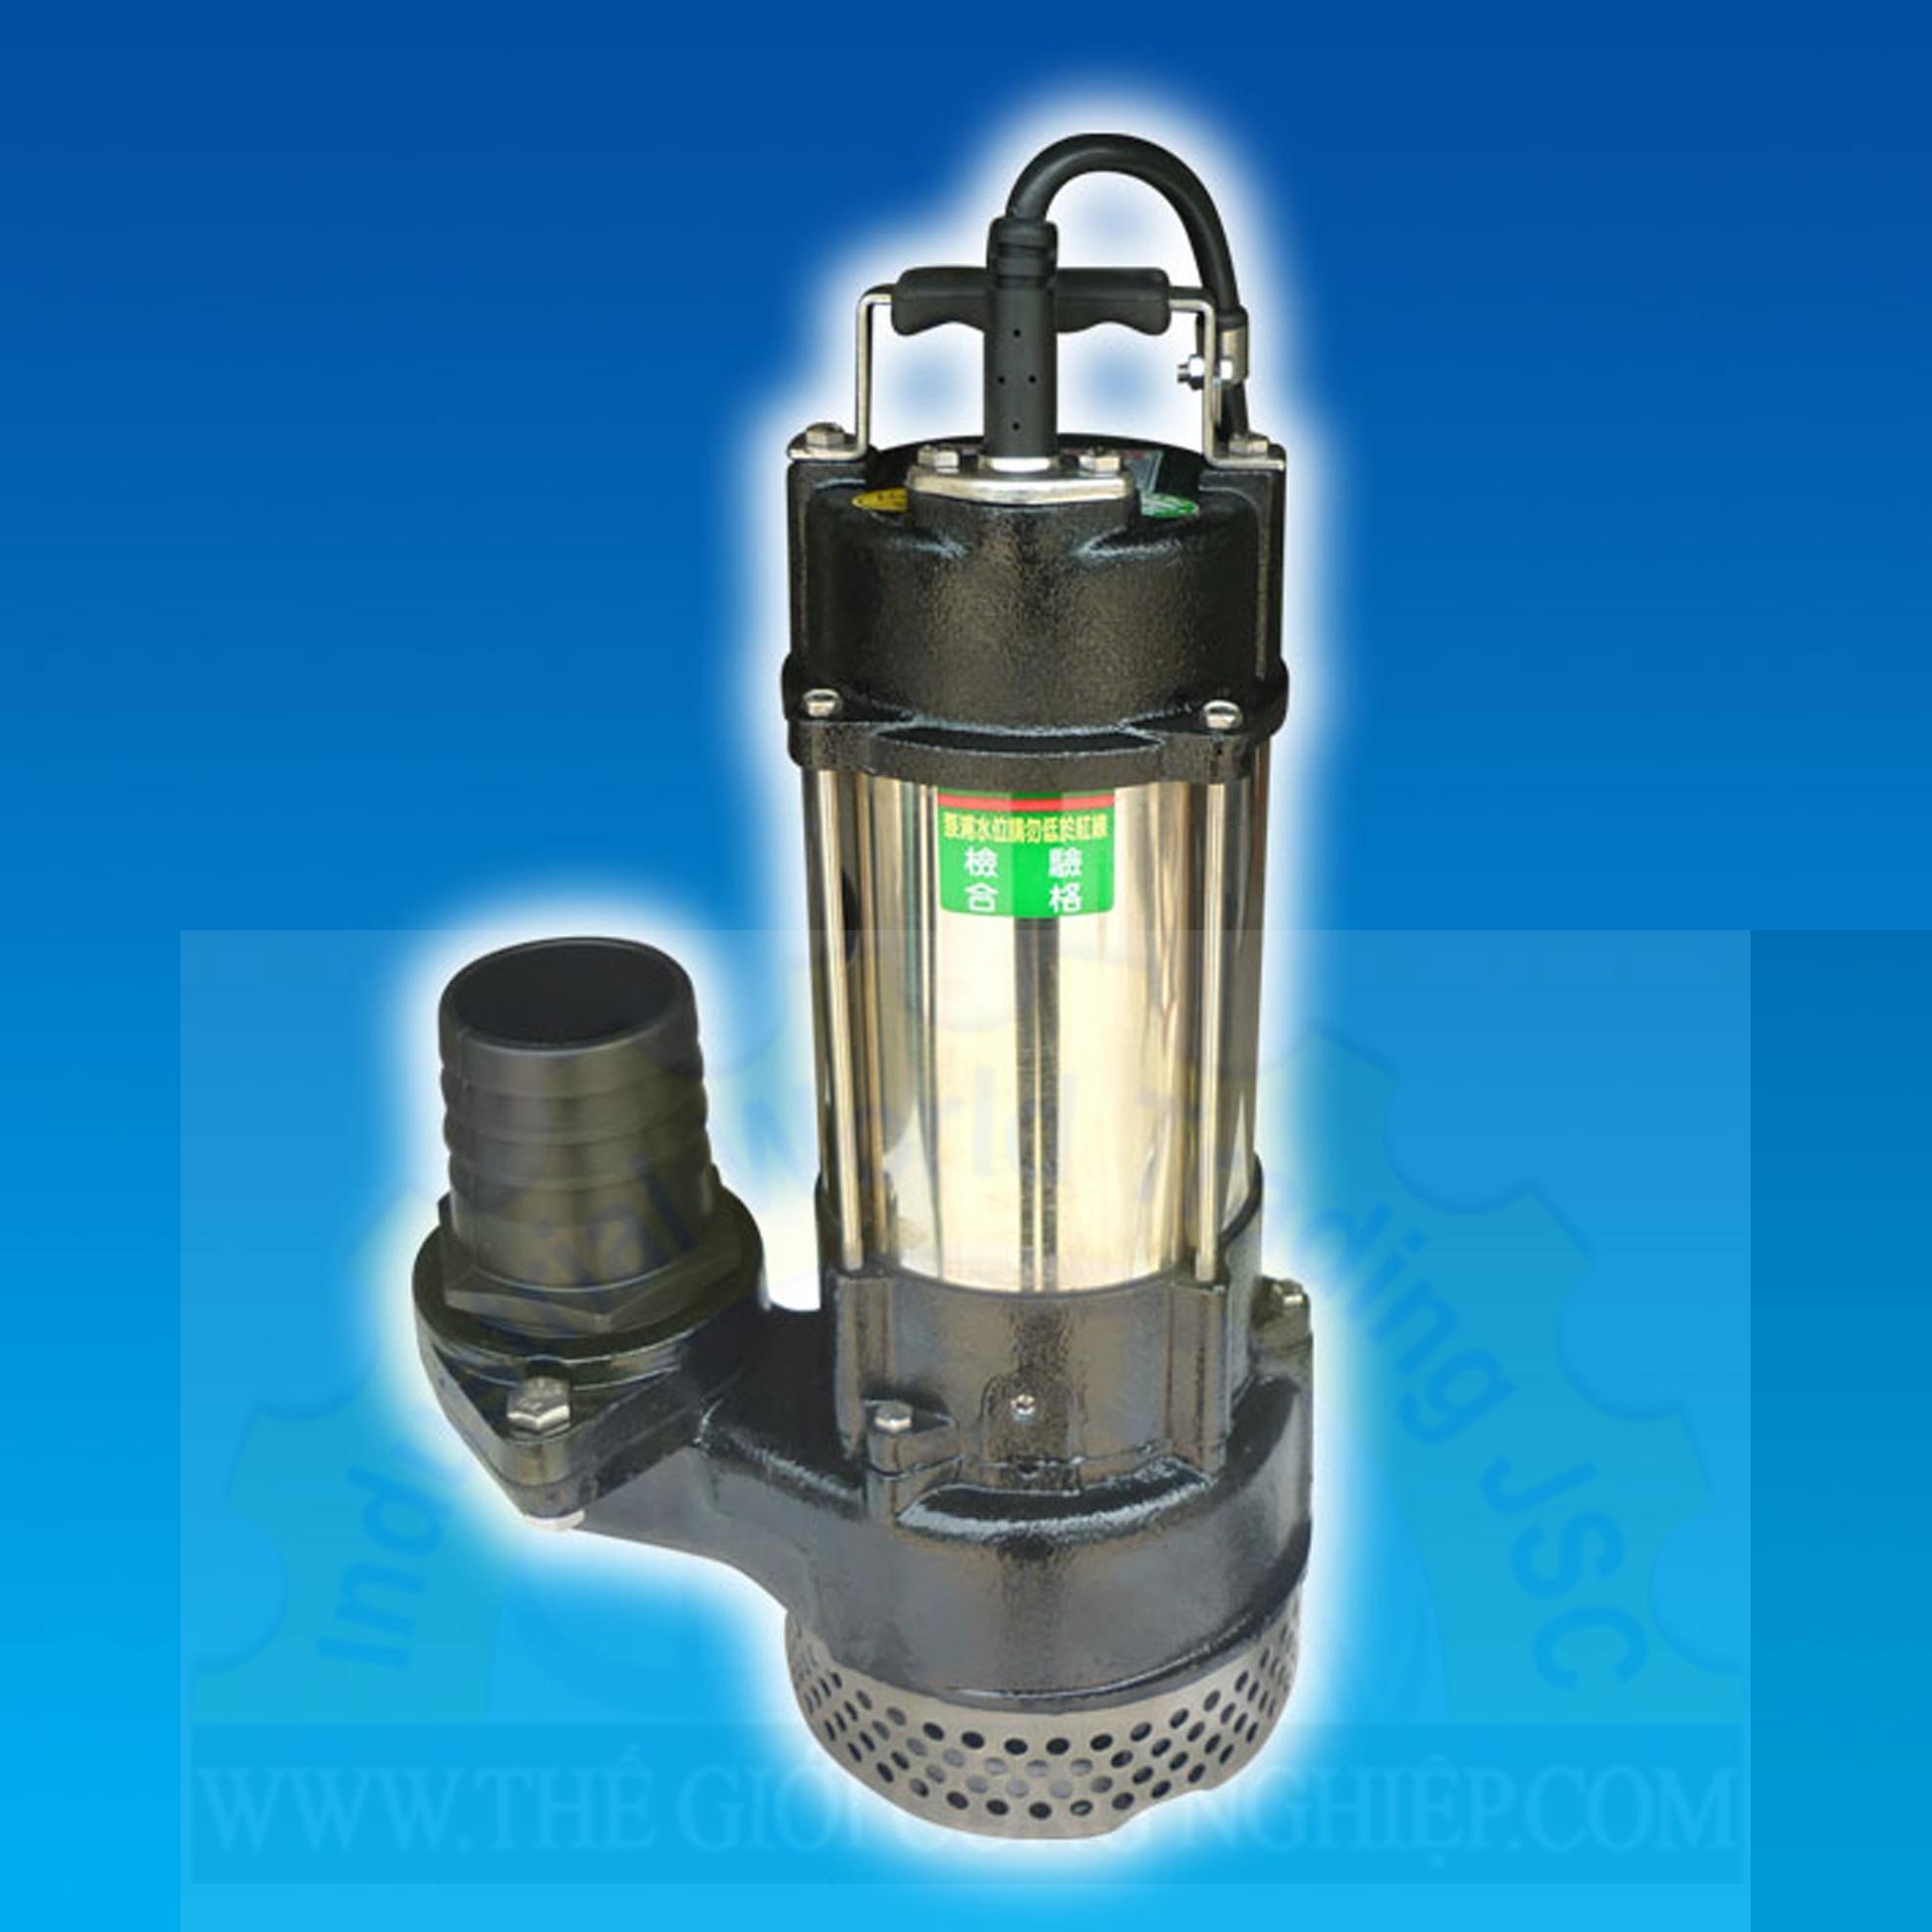 Sewage Submersible Pump HSM280-11.5 26 NationPump